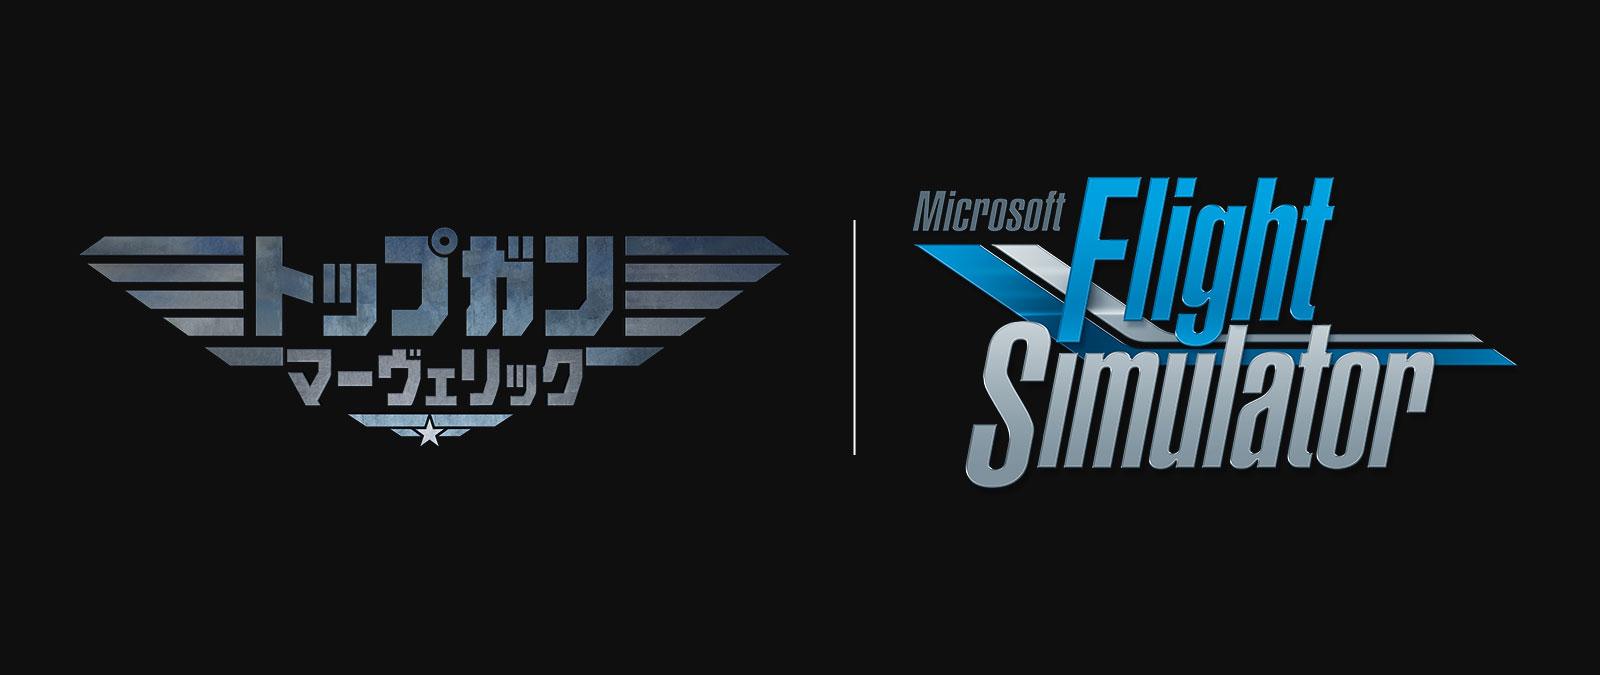 『Microsoft Flight Simulator』のロゴと『Top Gun』のロゴ